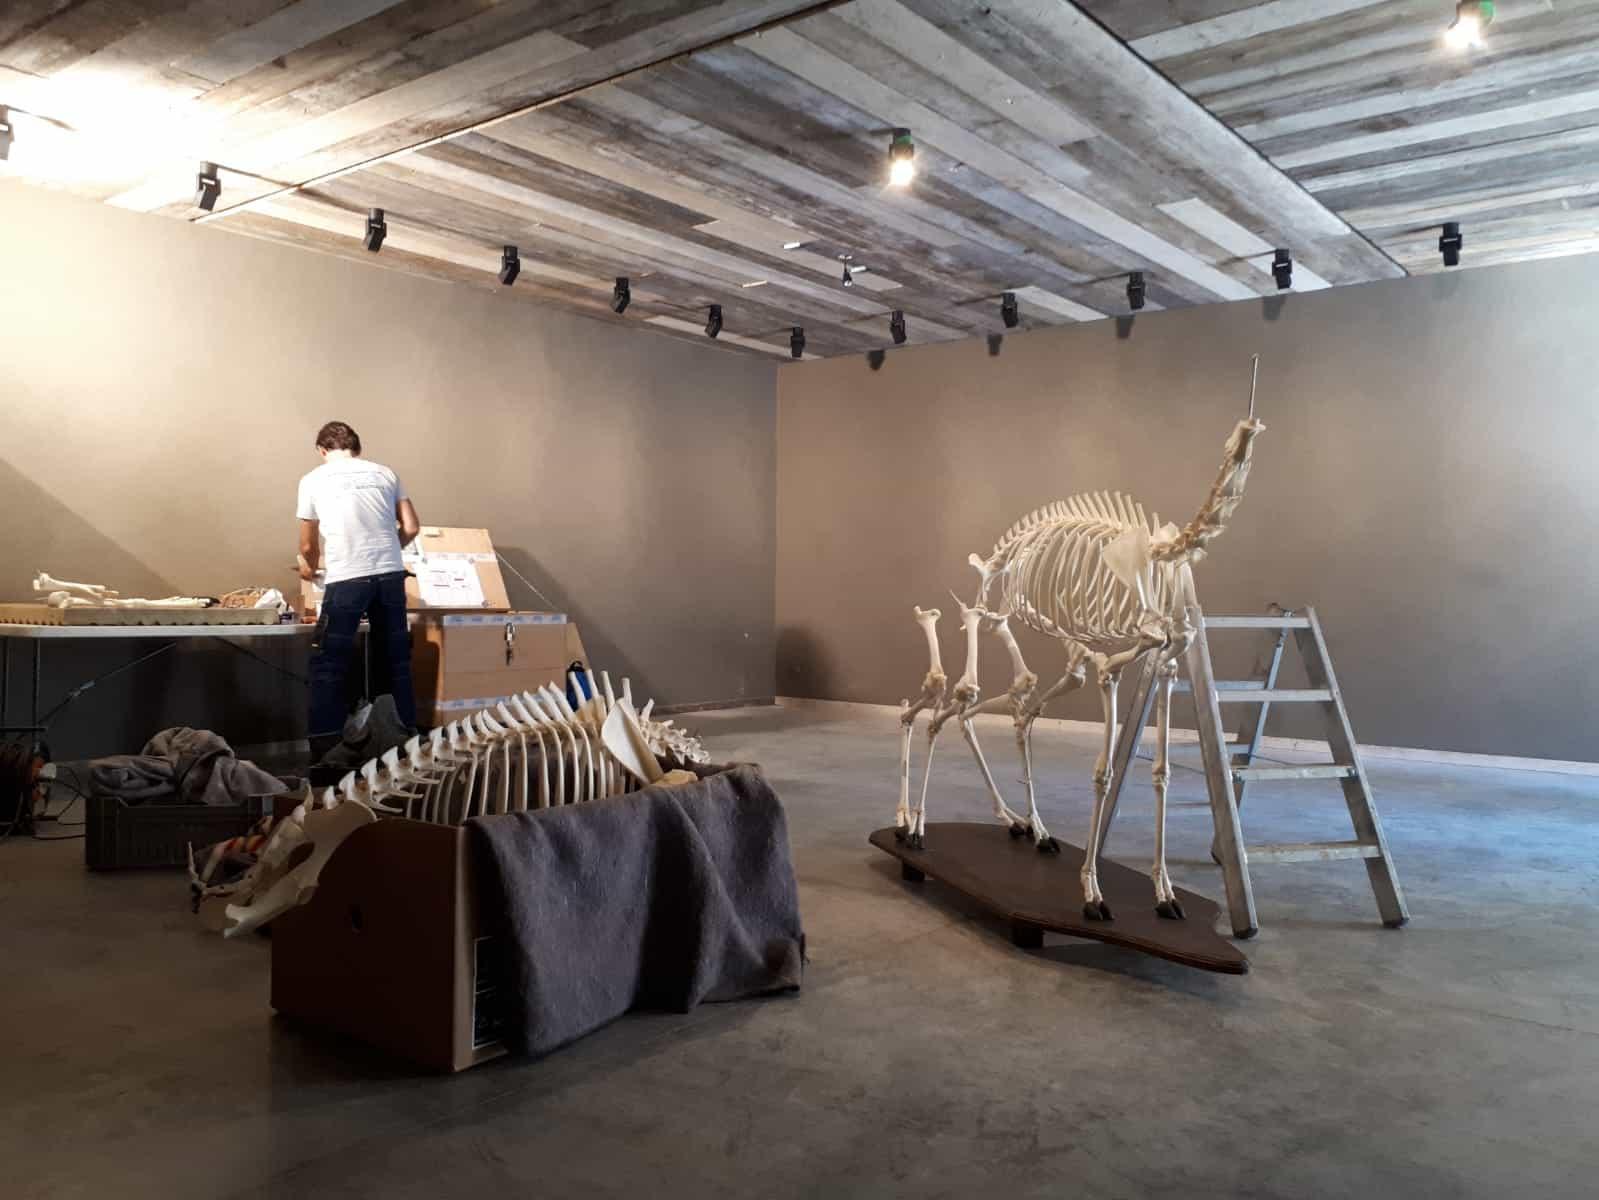 Skeletons | Mounting skeletons on Location | Limburghuis GAIA Zoo